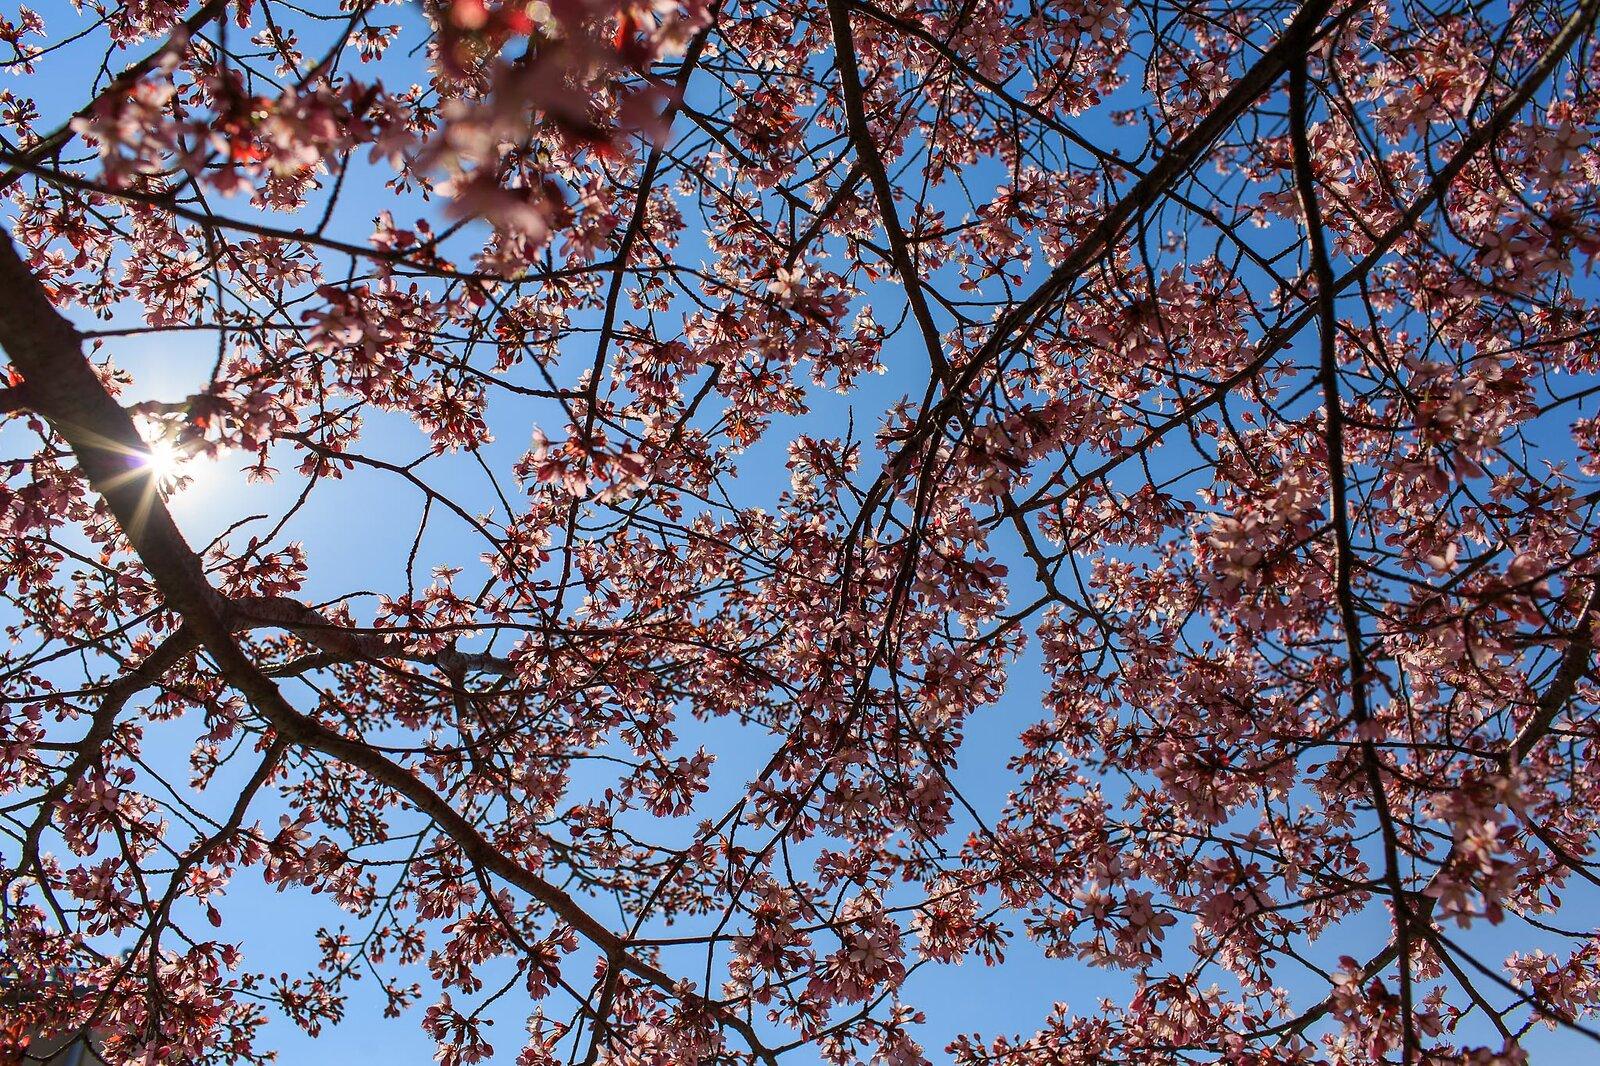 magnolia_2553_Canon_EOS_5D_Mark_III_EF35mm_f-1.4L_USM.jpg